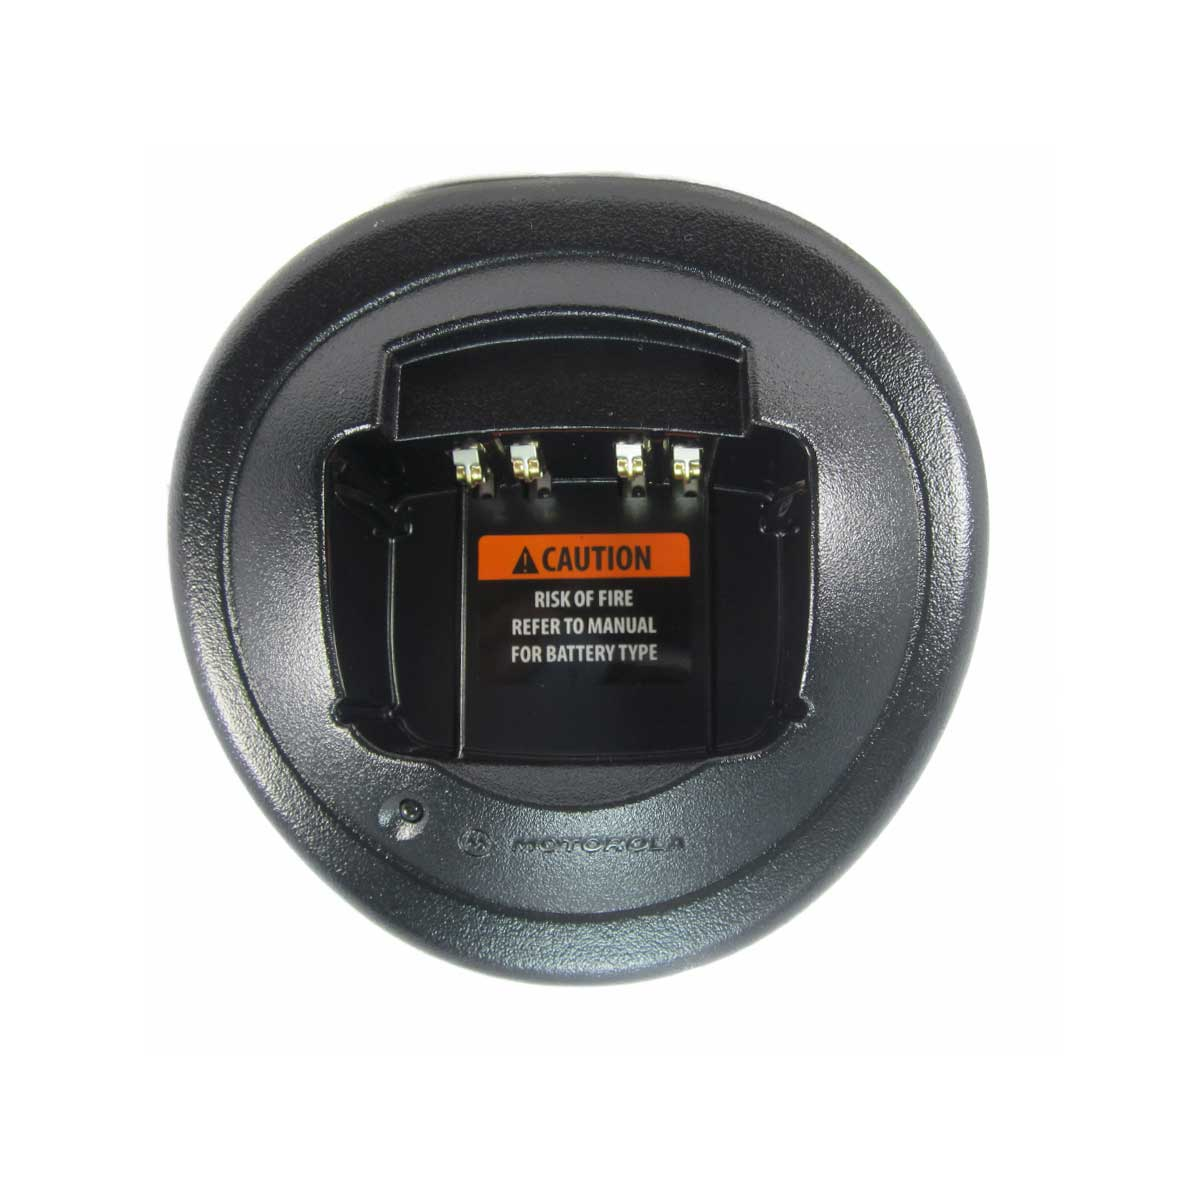 Cargador individual Motorola de carga rápida AAHTN3000